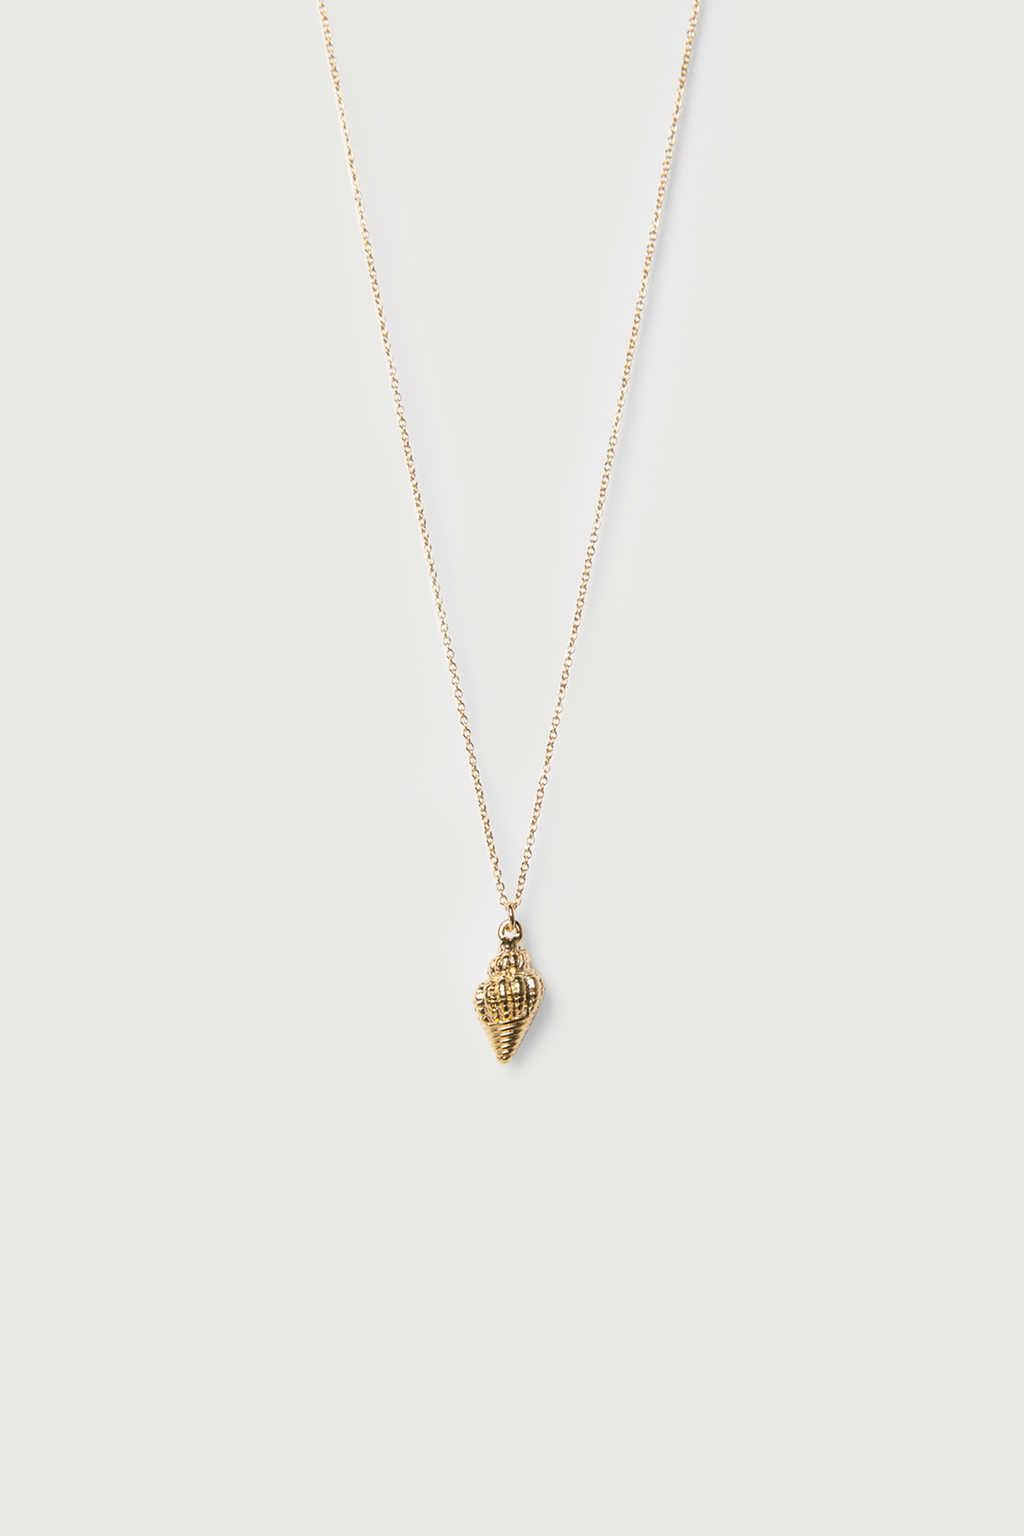 Necklace K007 Gold 2